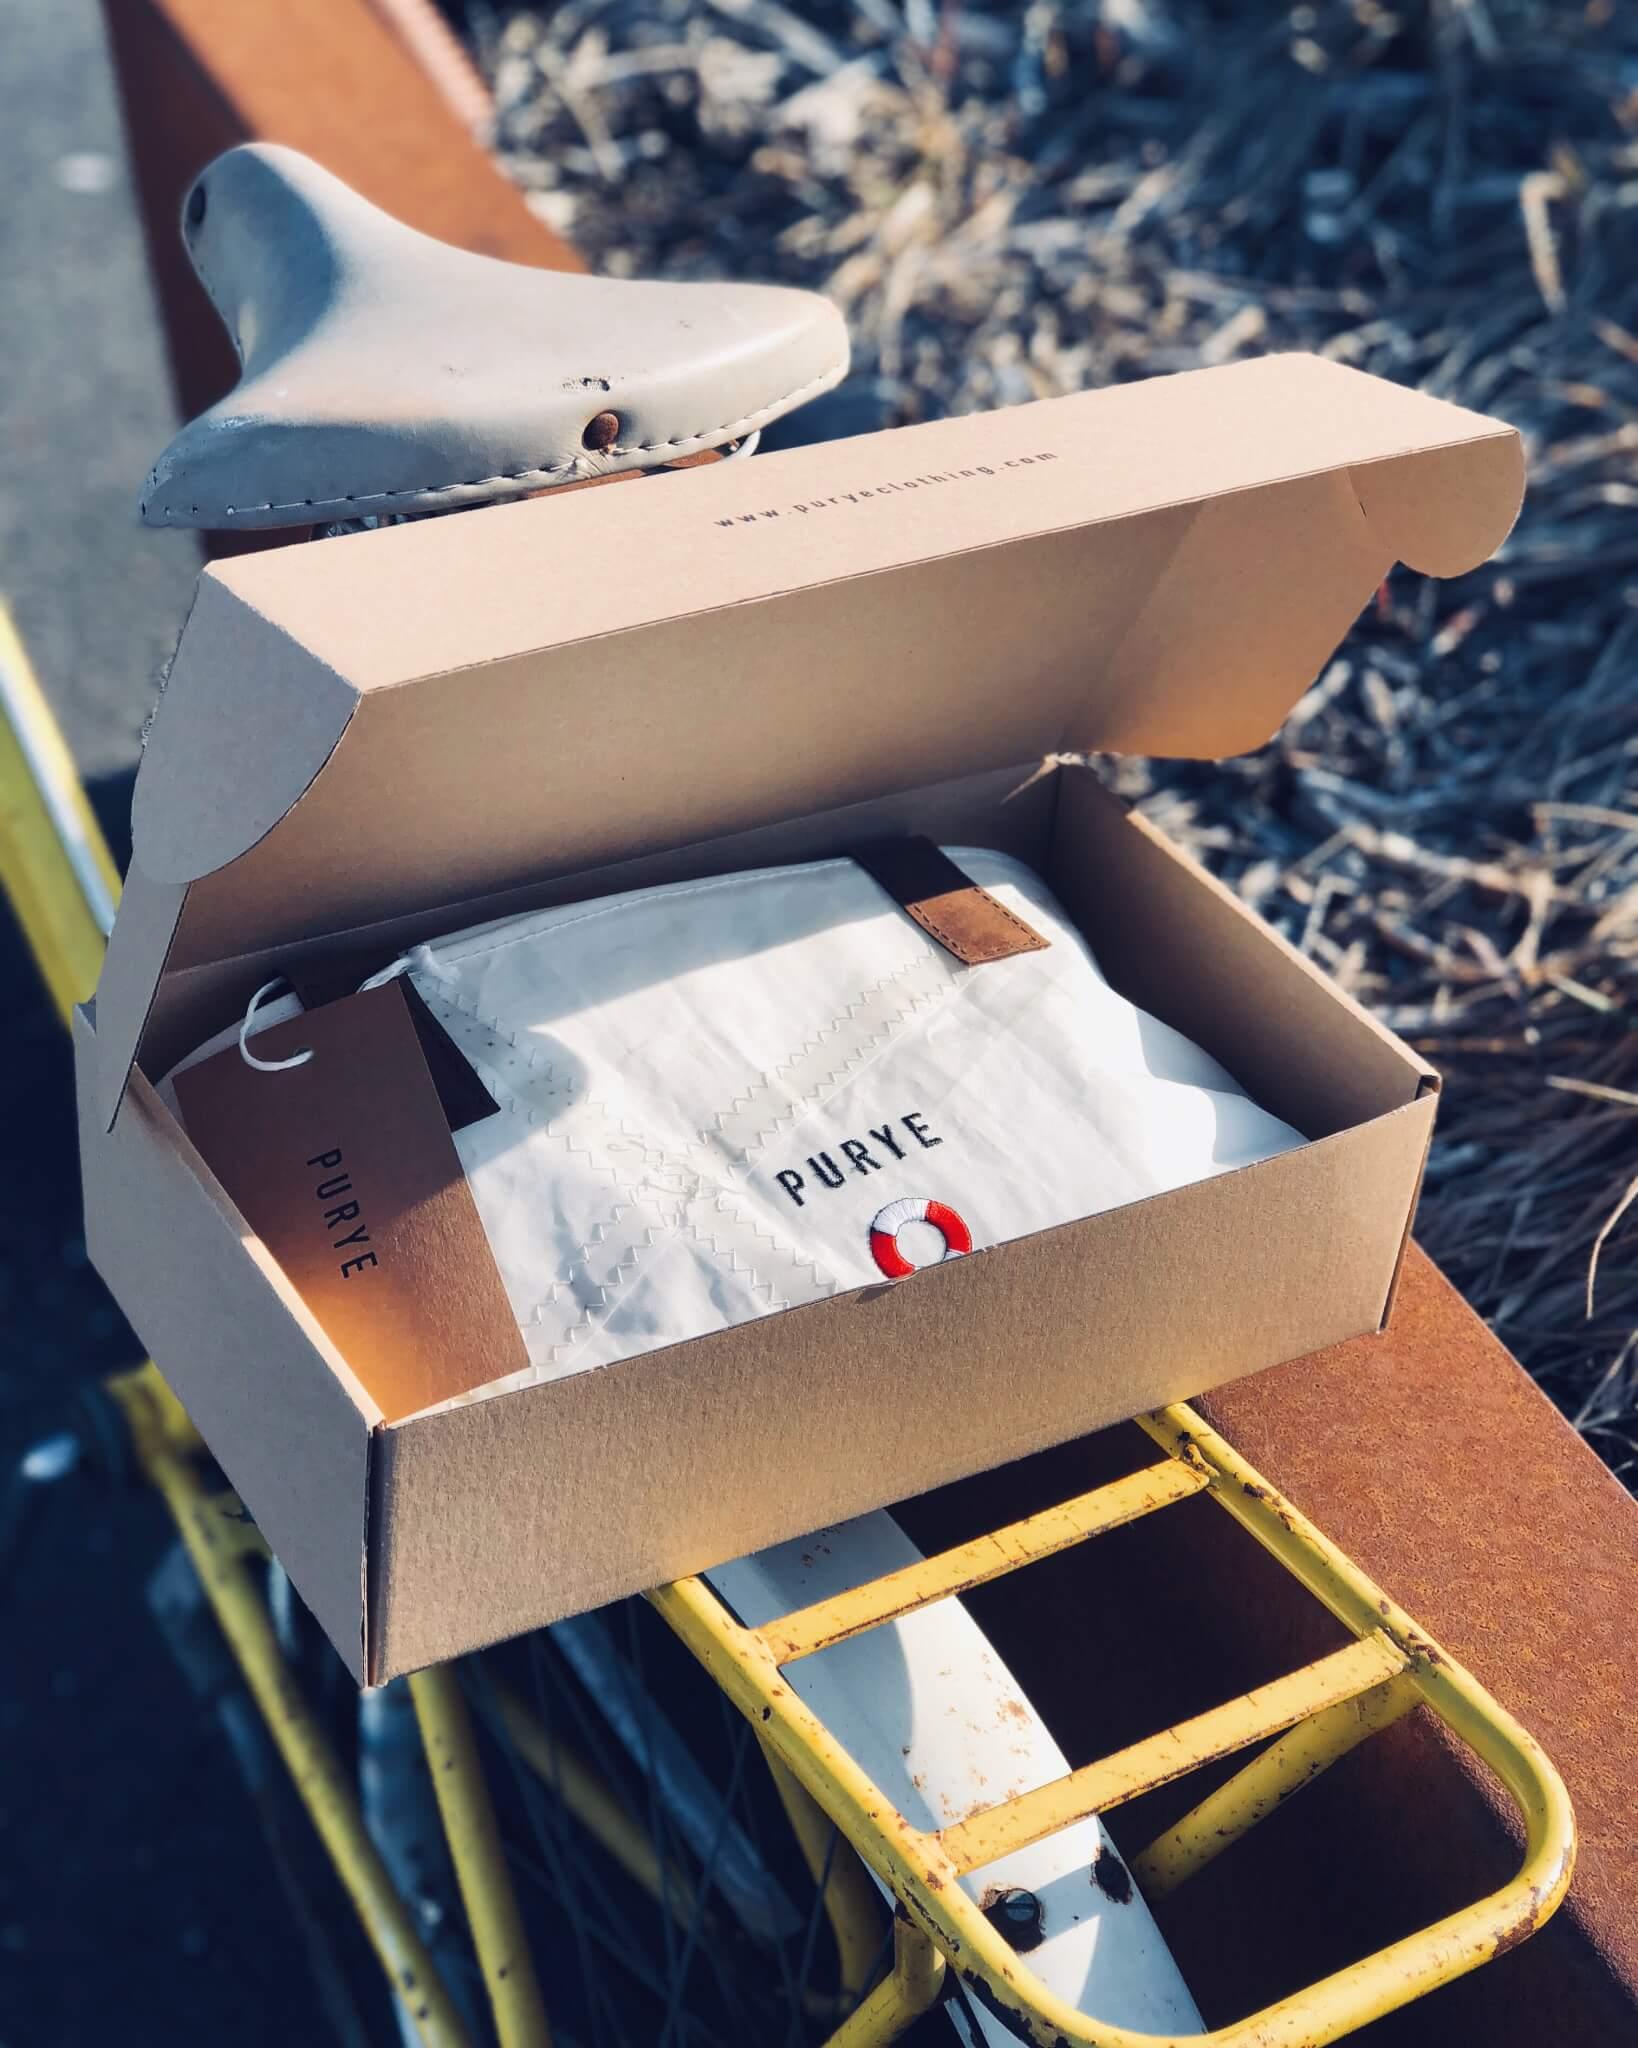 purye clothing_scatola postali_imballaggi di packhelp